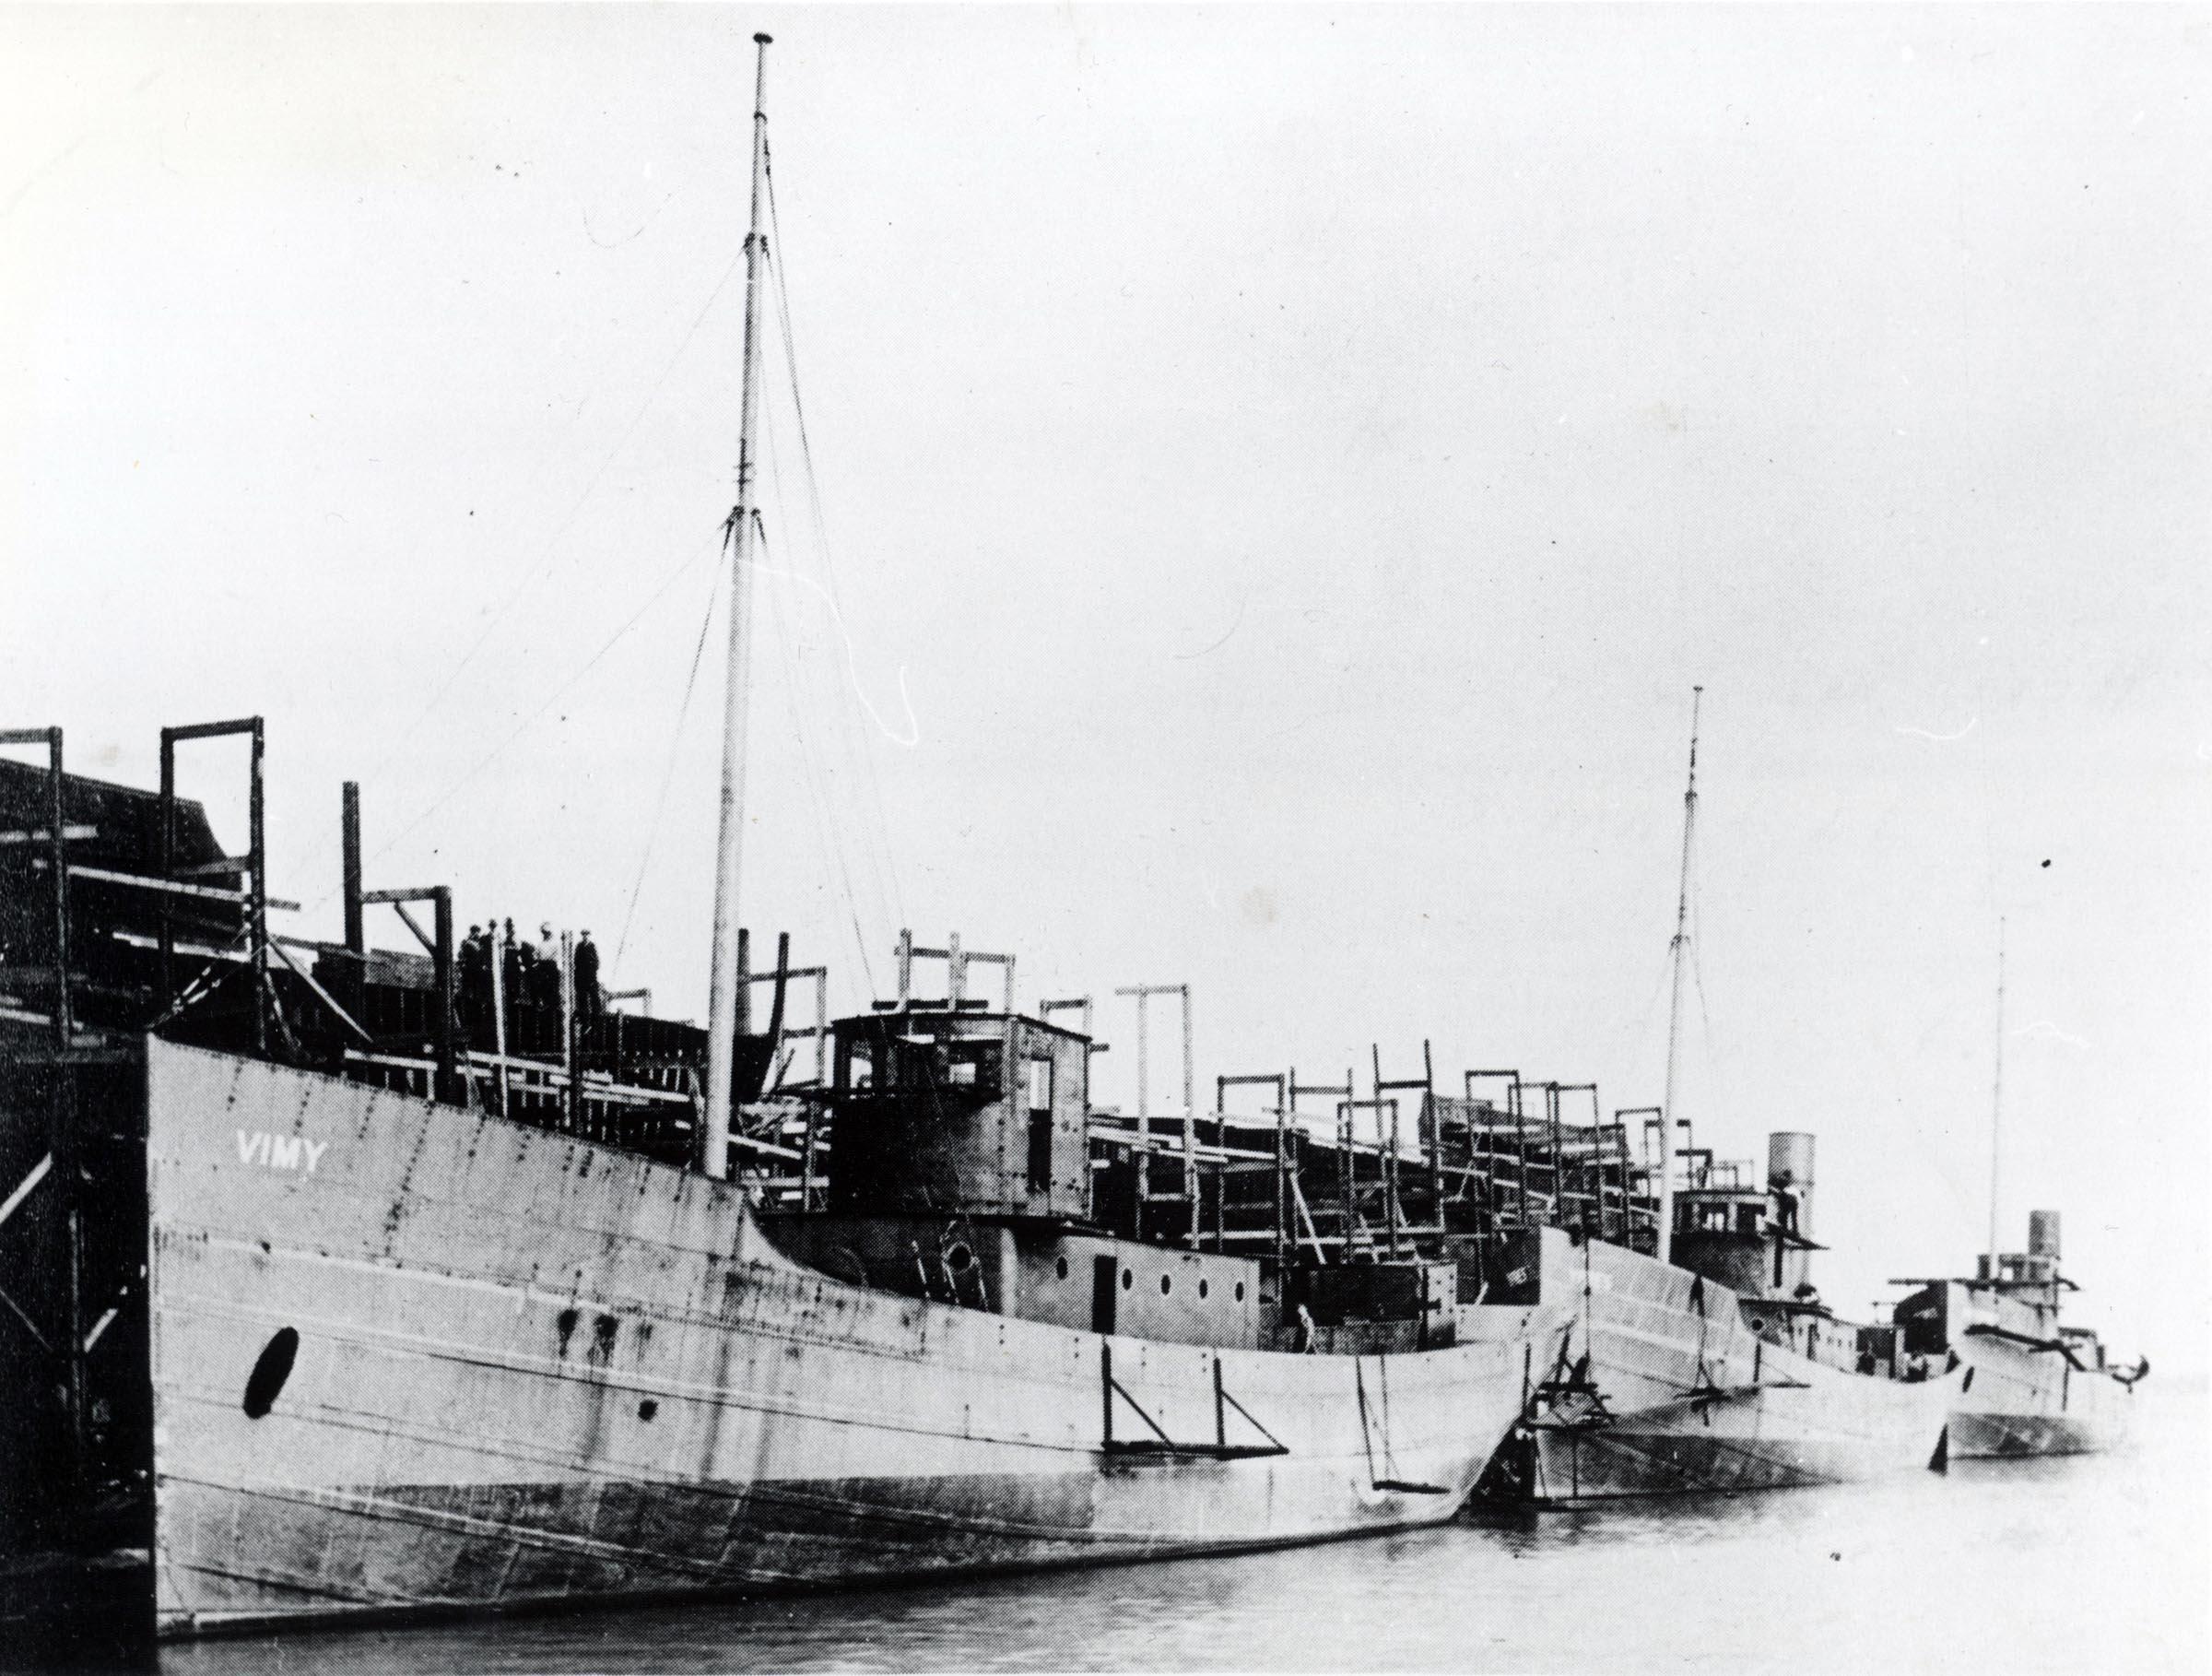 HMCS VIMY